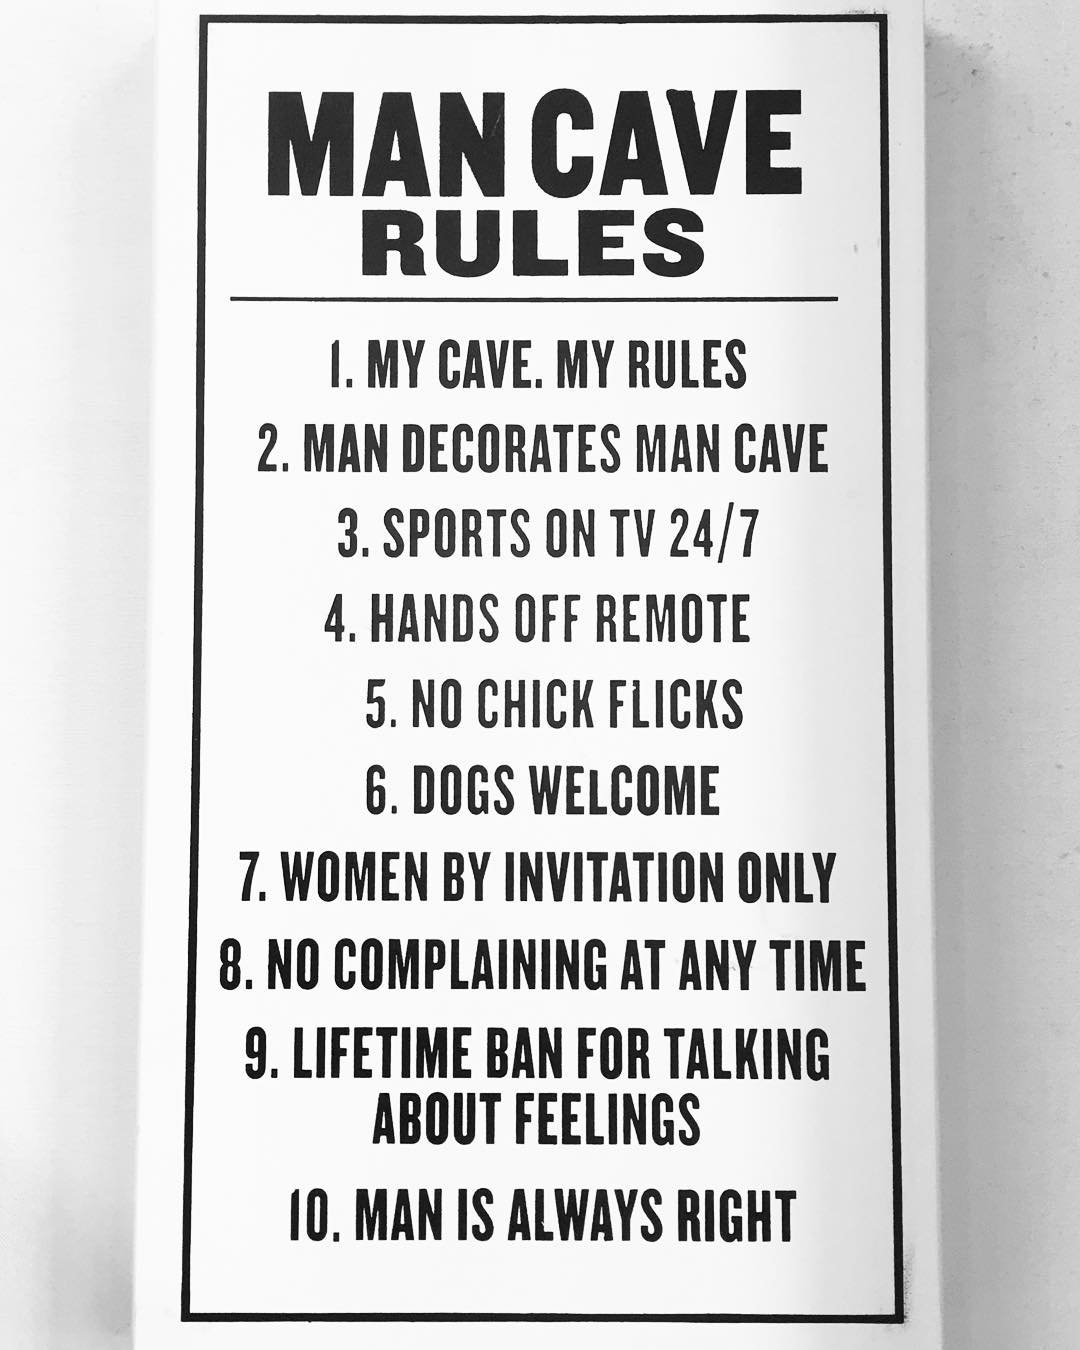 #dudesbelike #mancave